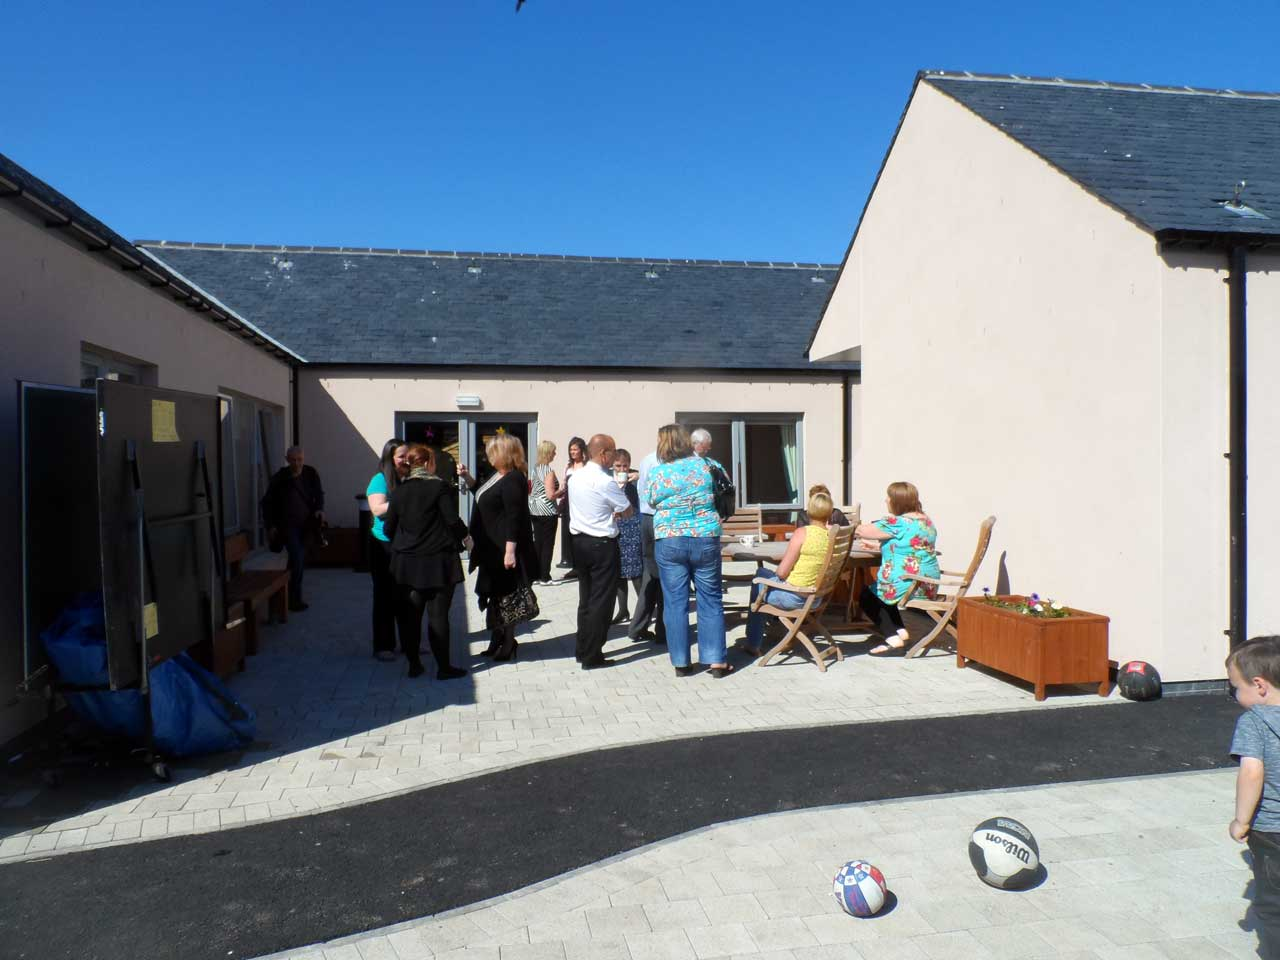 Photo: New Children's Home In Wick Opened 25 June 2014